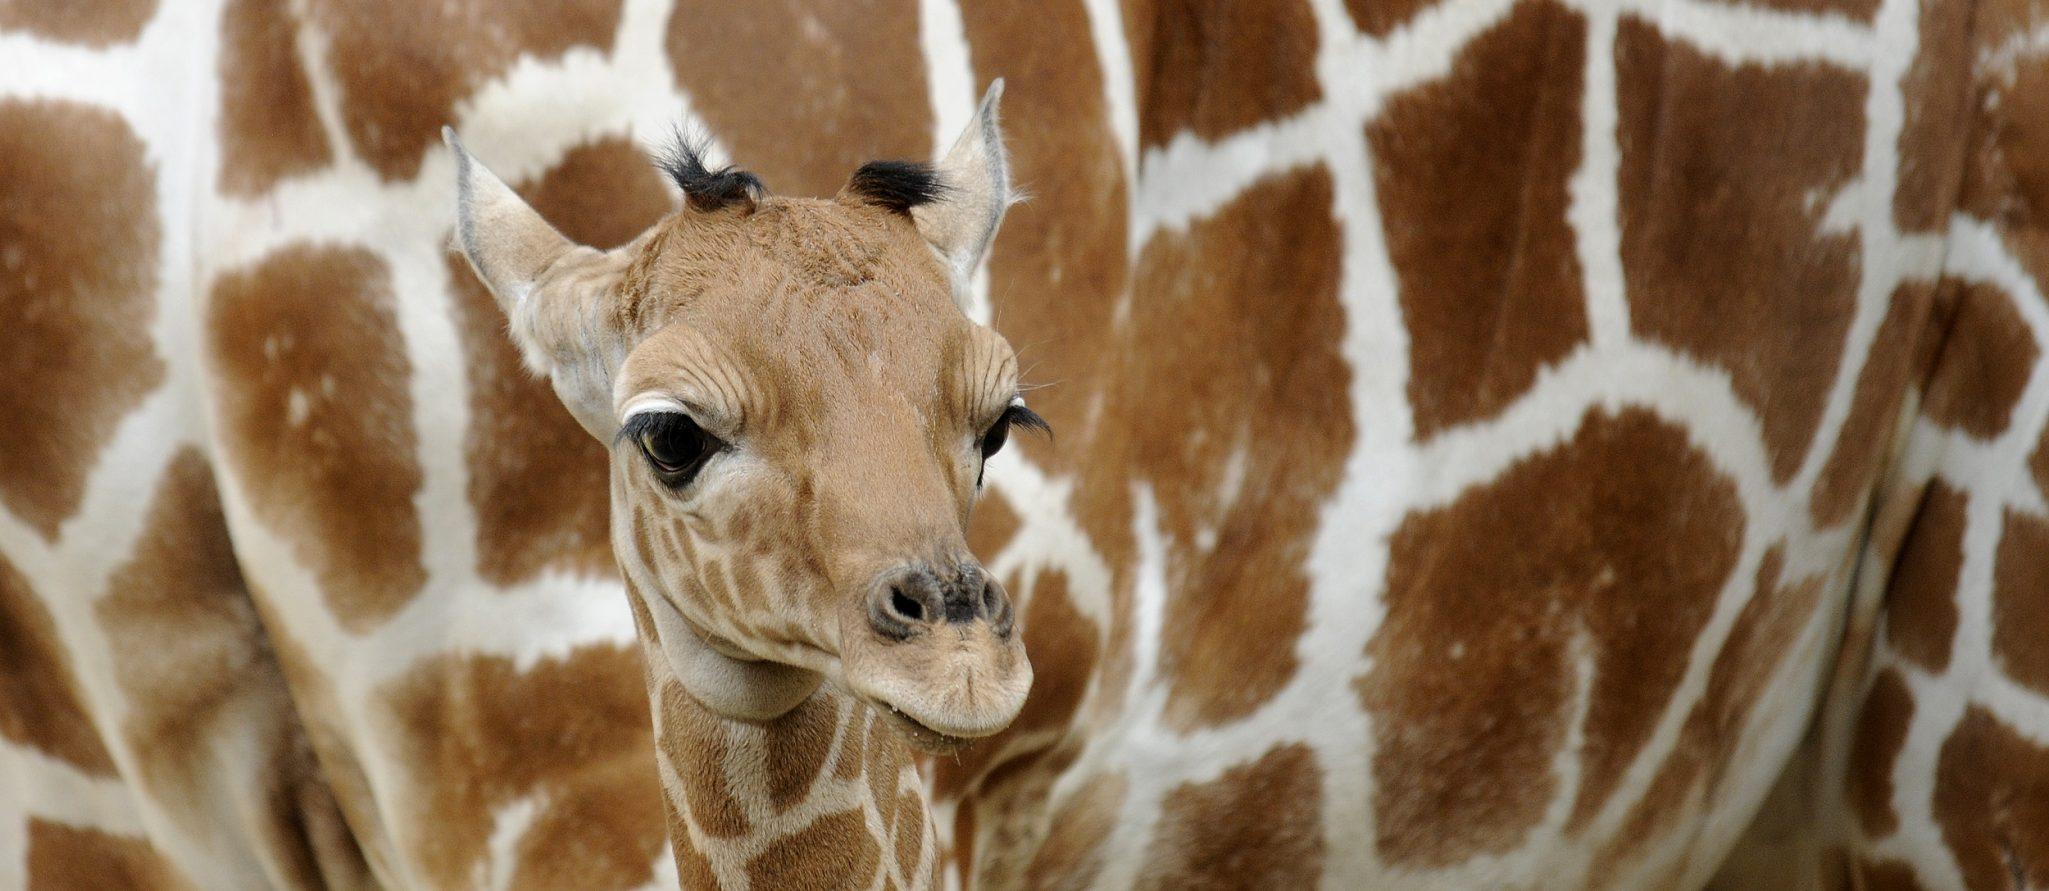 newborn giraffe khaleesi